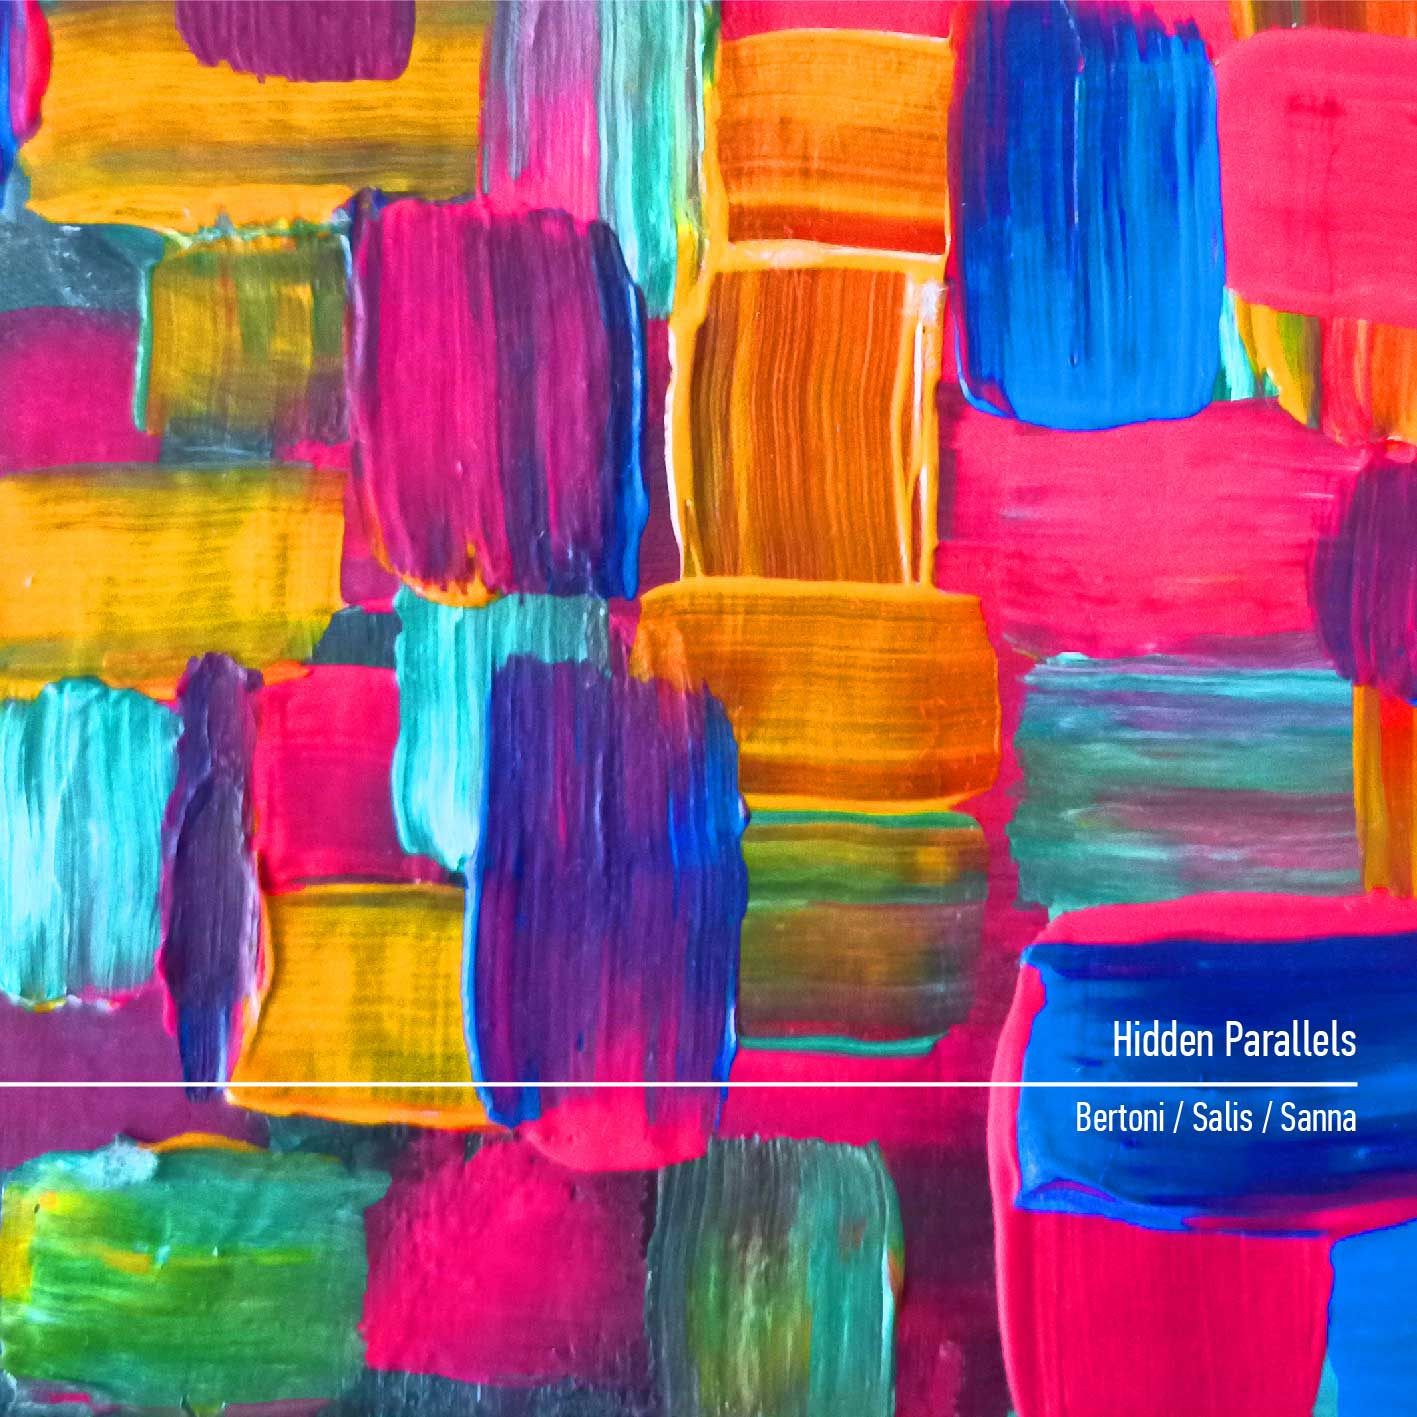 Bertoni / Salis / Sanna – Hidden Parallels